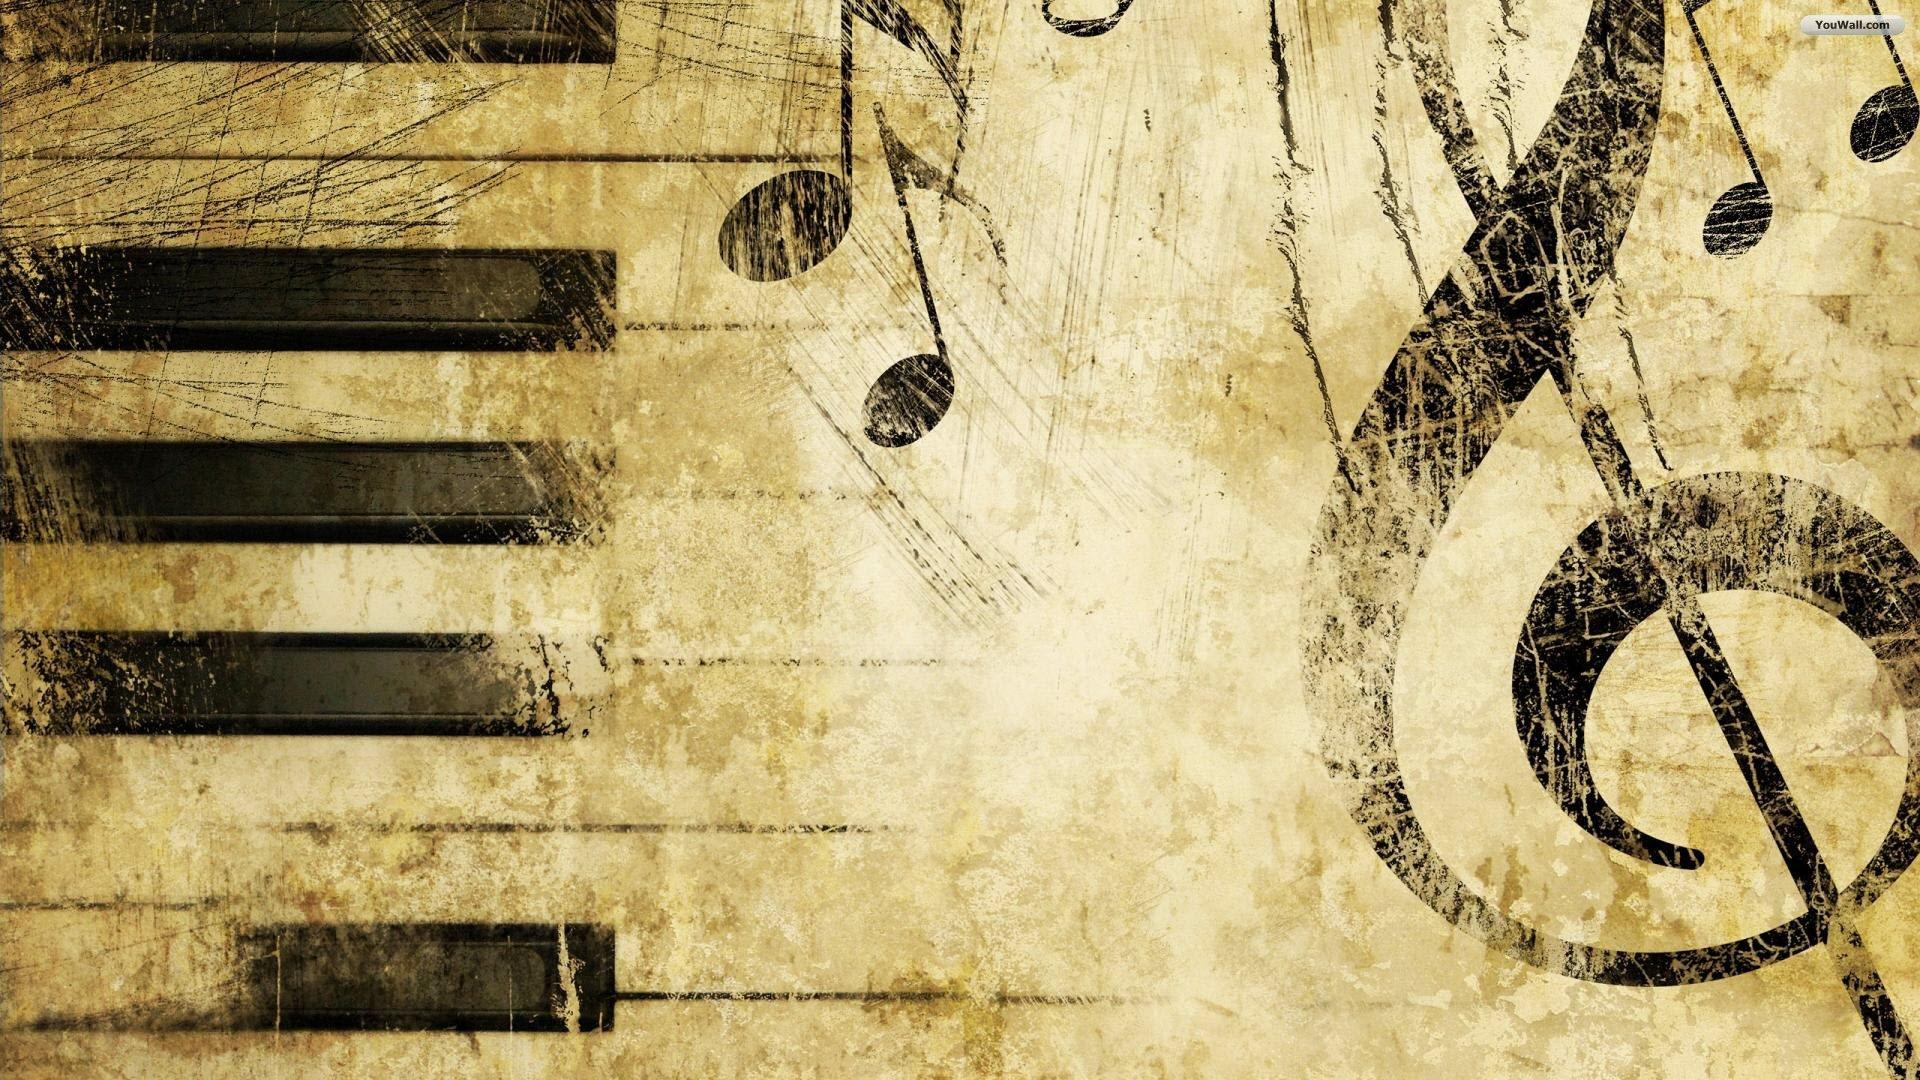 Classic Music Wallpaper   wallpaperwallpapersfree wallpaper 1920x1080